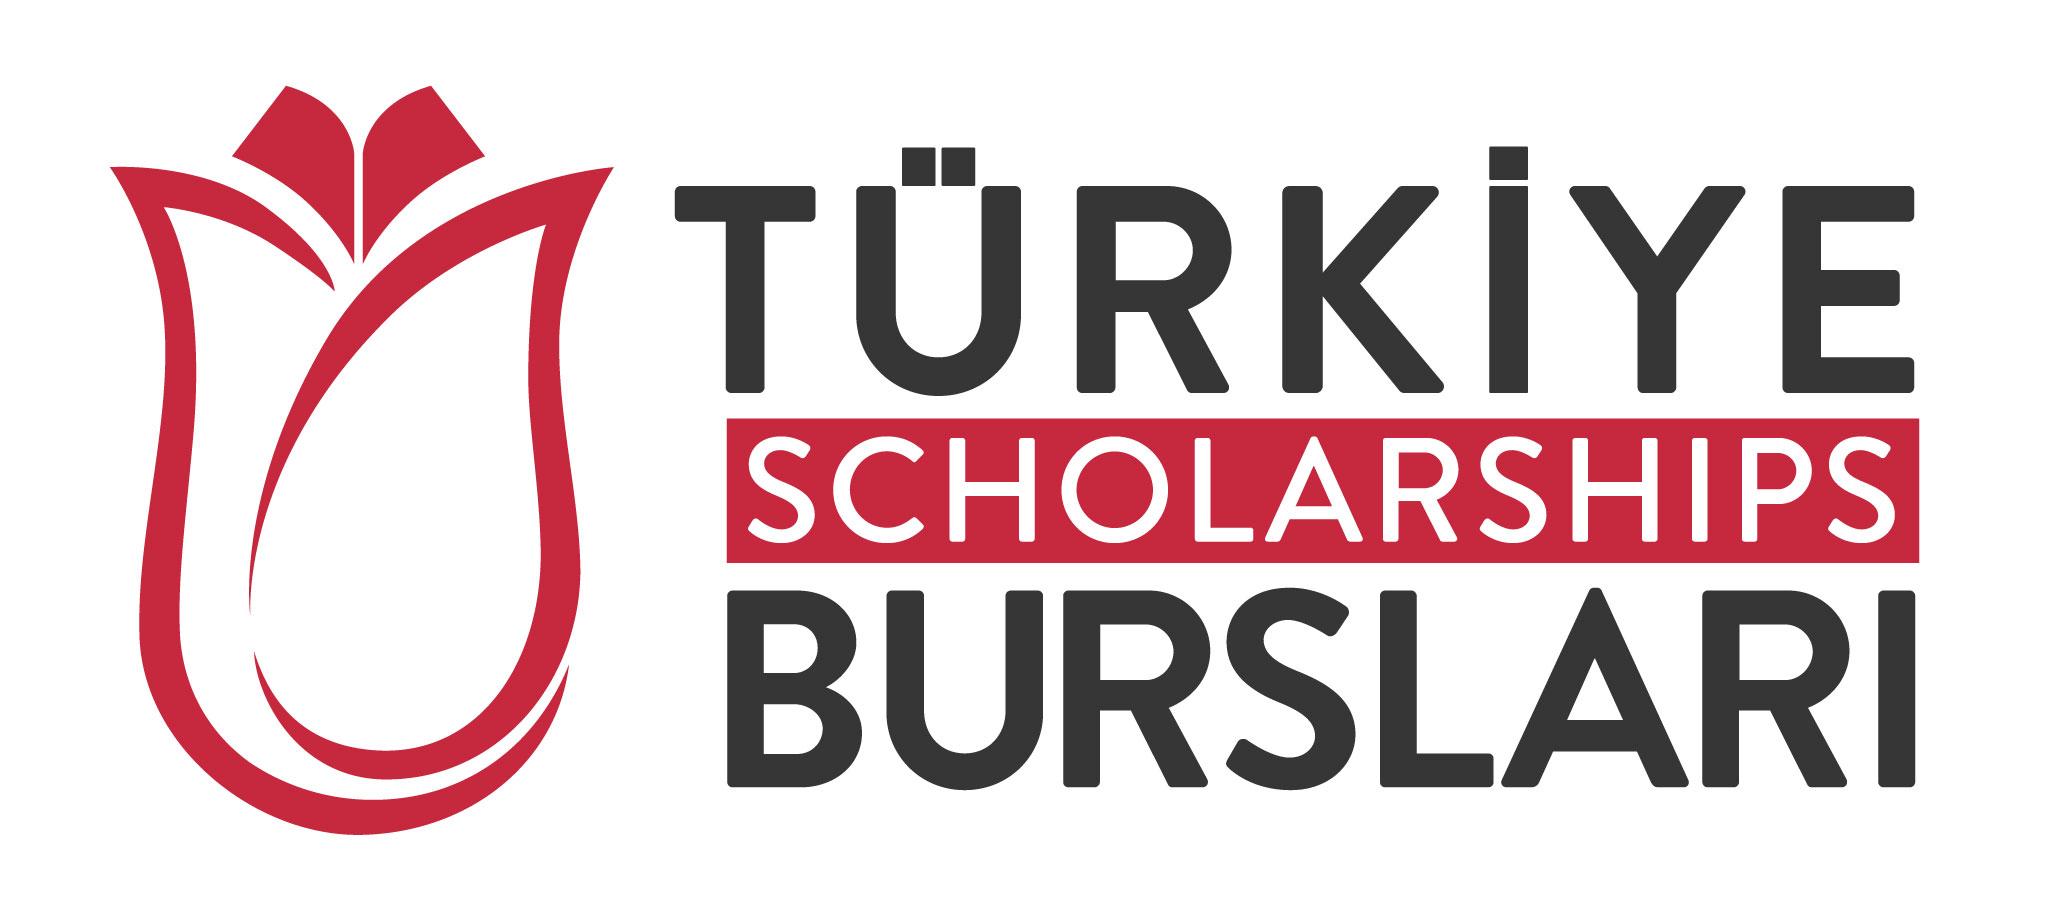 Apply for Türkiye Scholarships 2021 for Undergraduate & Postgraduate Studies in Turkey (Fully-funded)